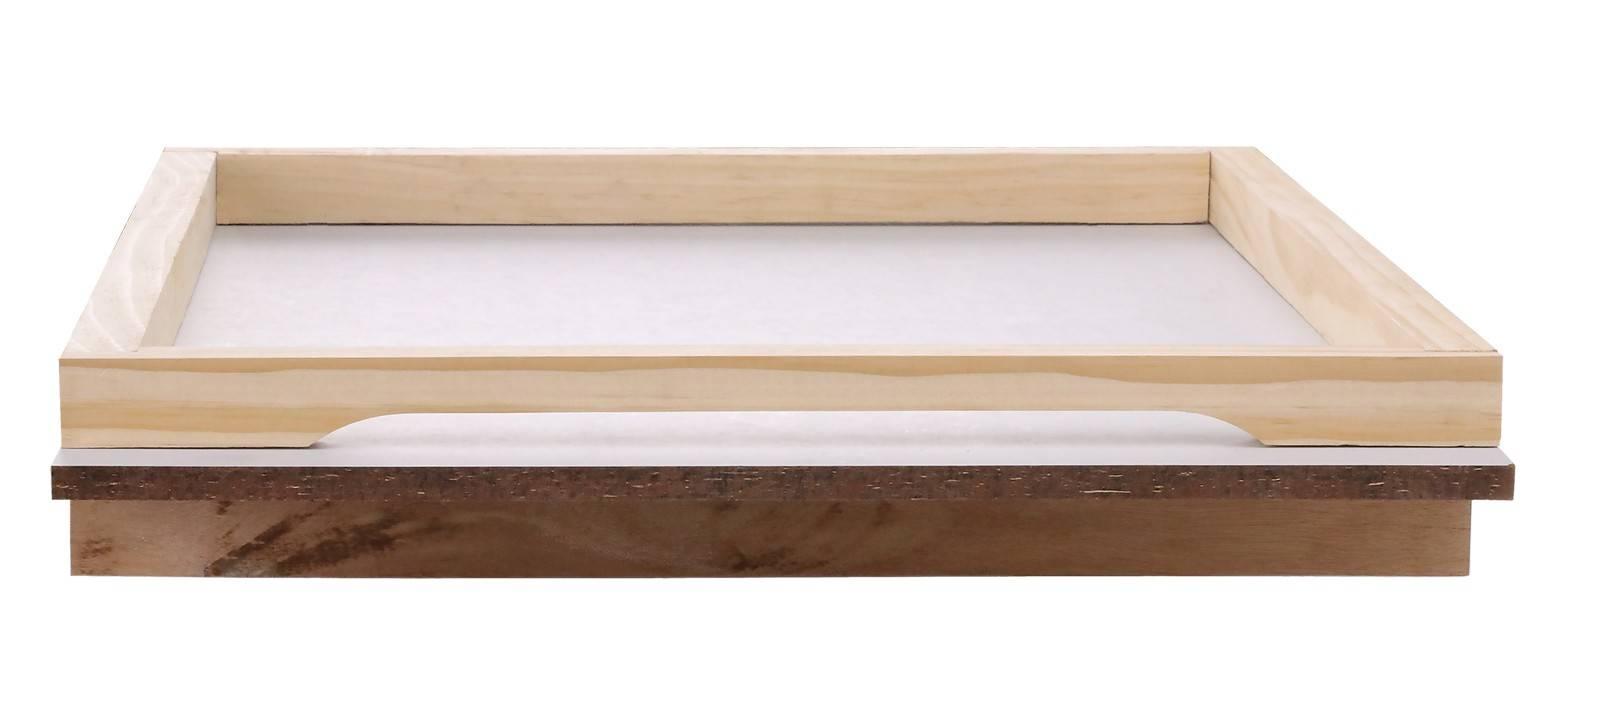 Complete Gabled Lid -  10 Frame Full Depth double Alliance Beehive with 20 Frames, Inner cover & Australian made base